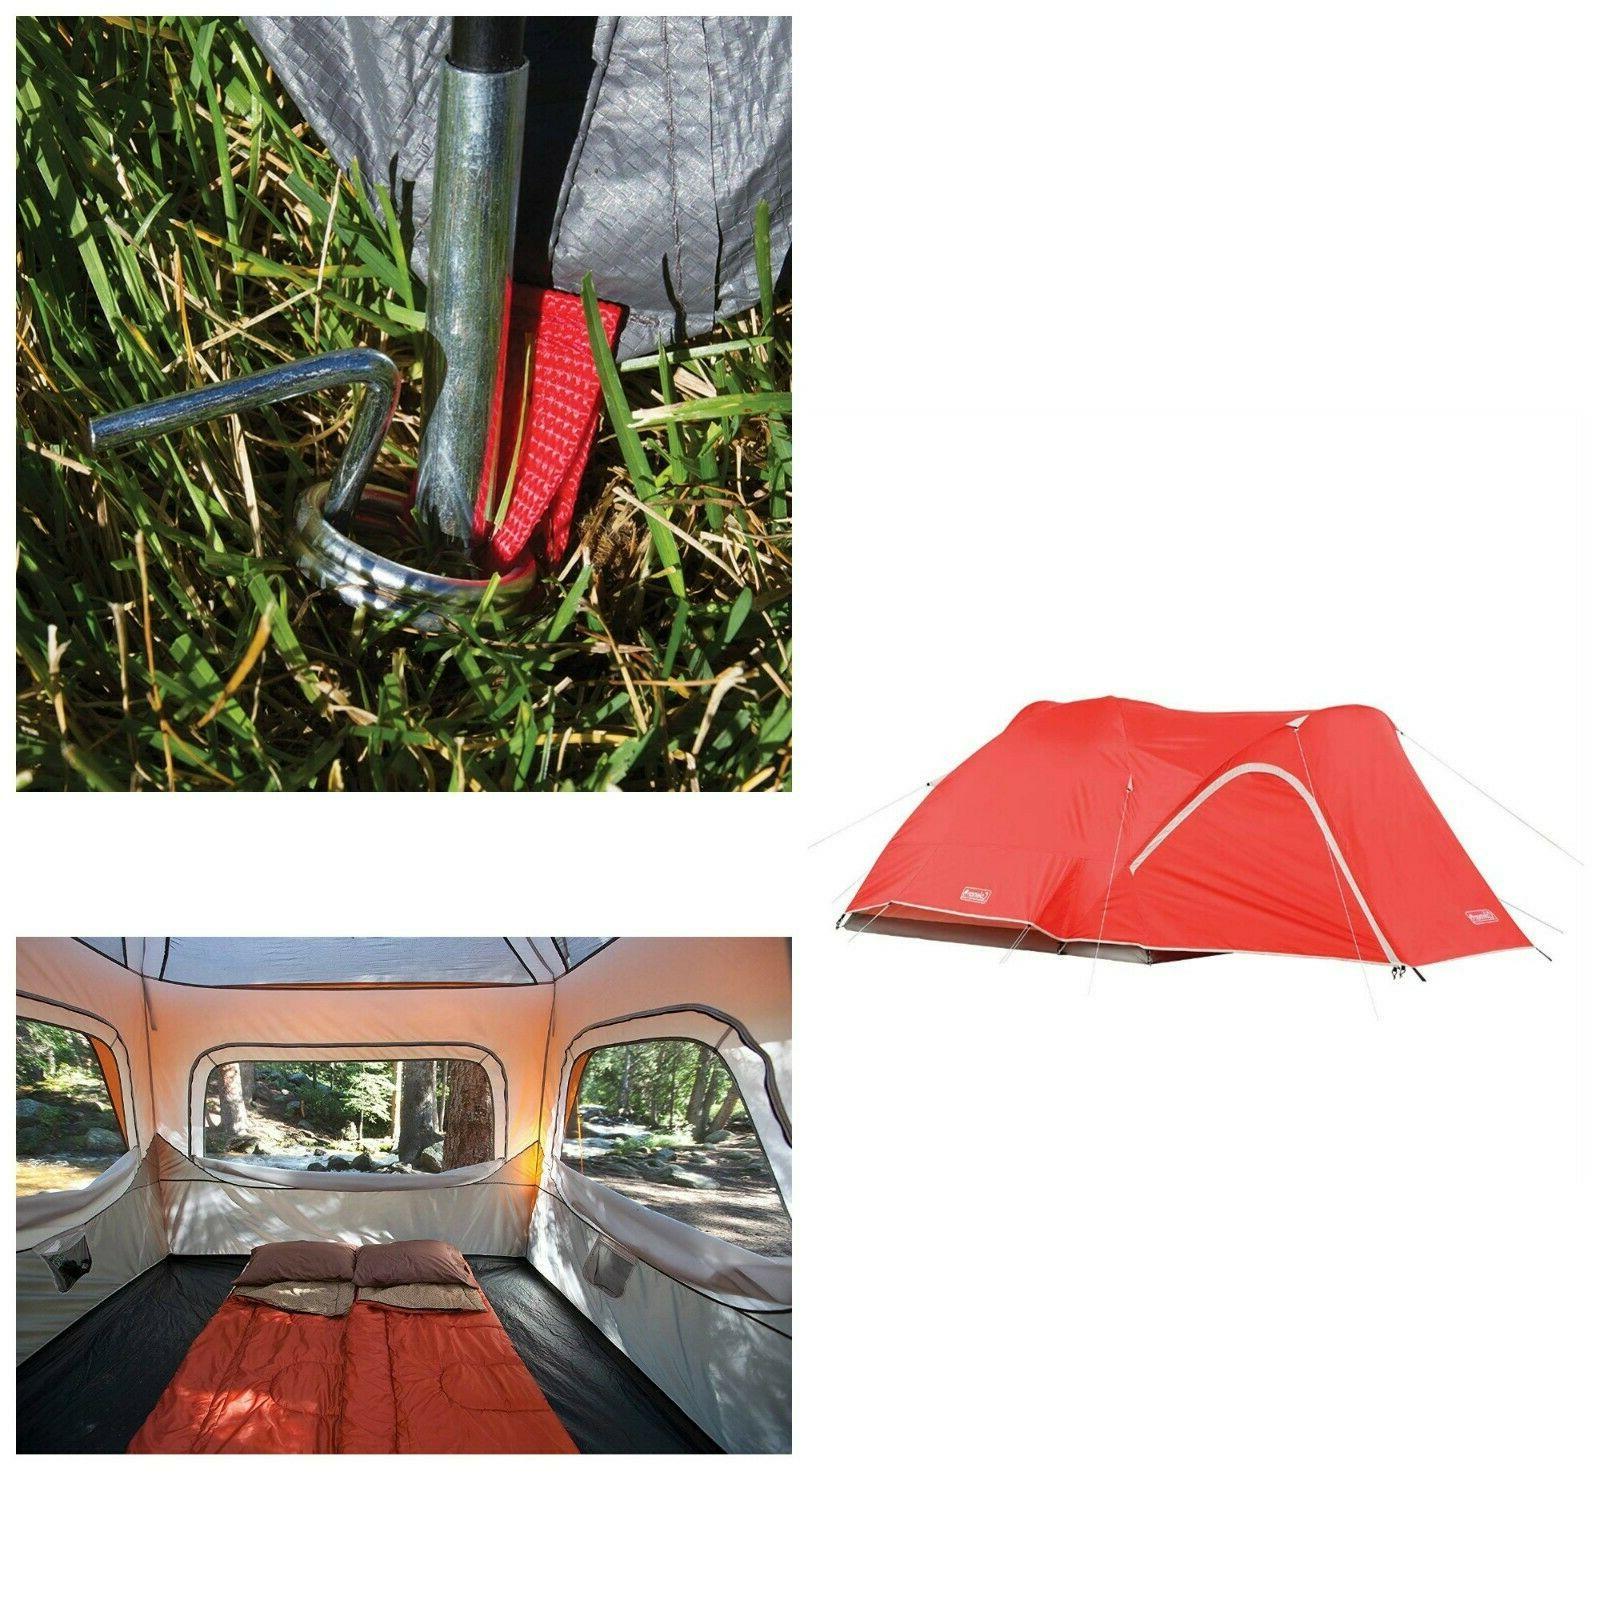 Coleman Hooligan Tent Waterproof Camping Backpacking 4 Perso